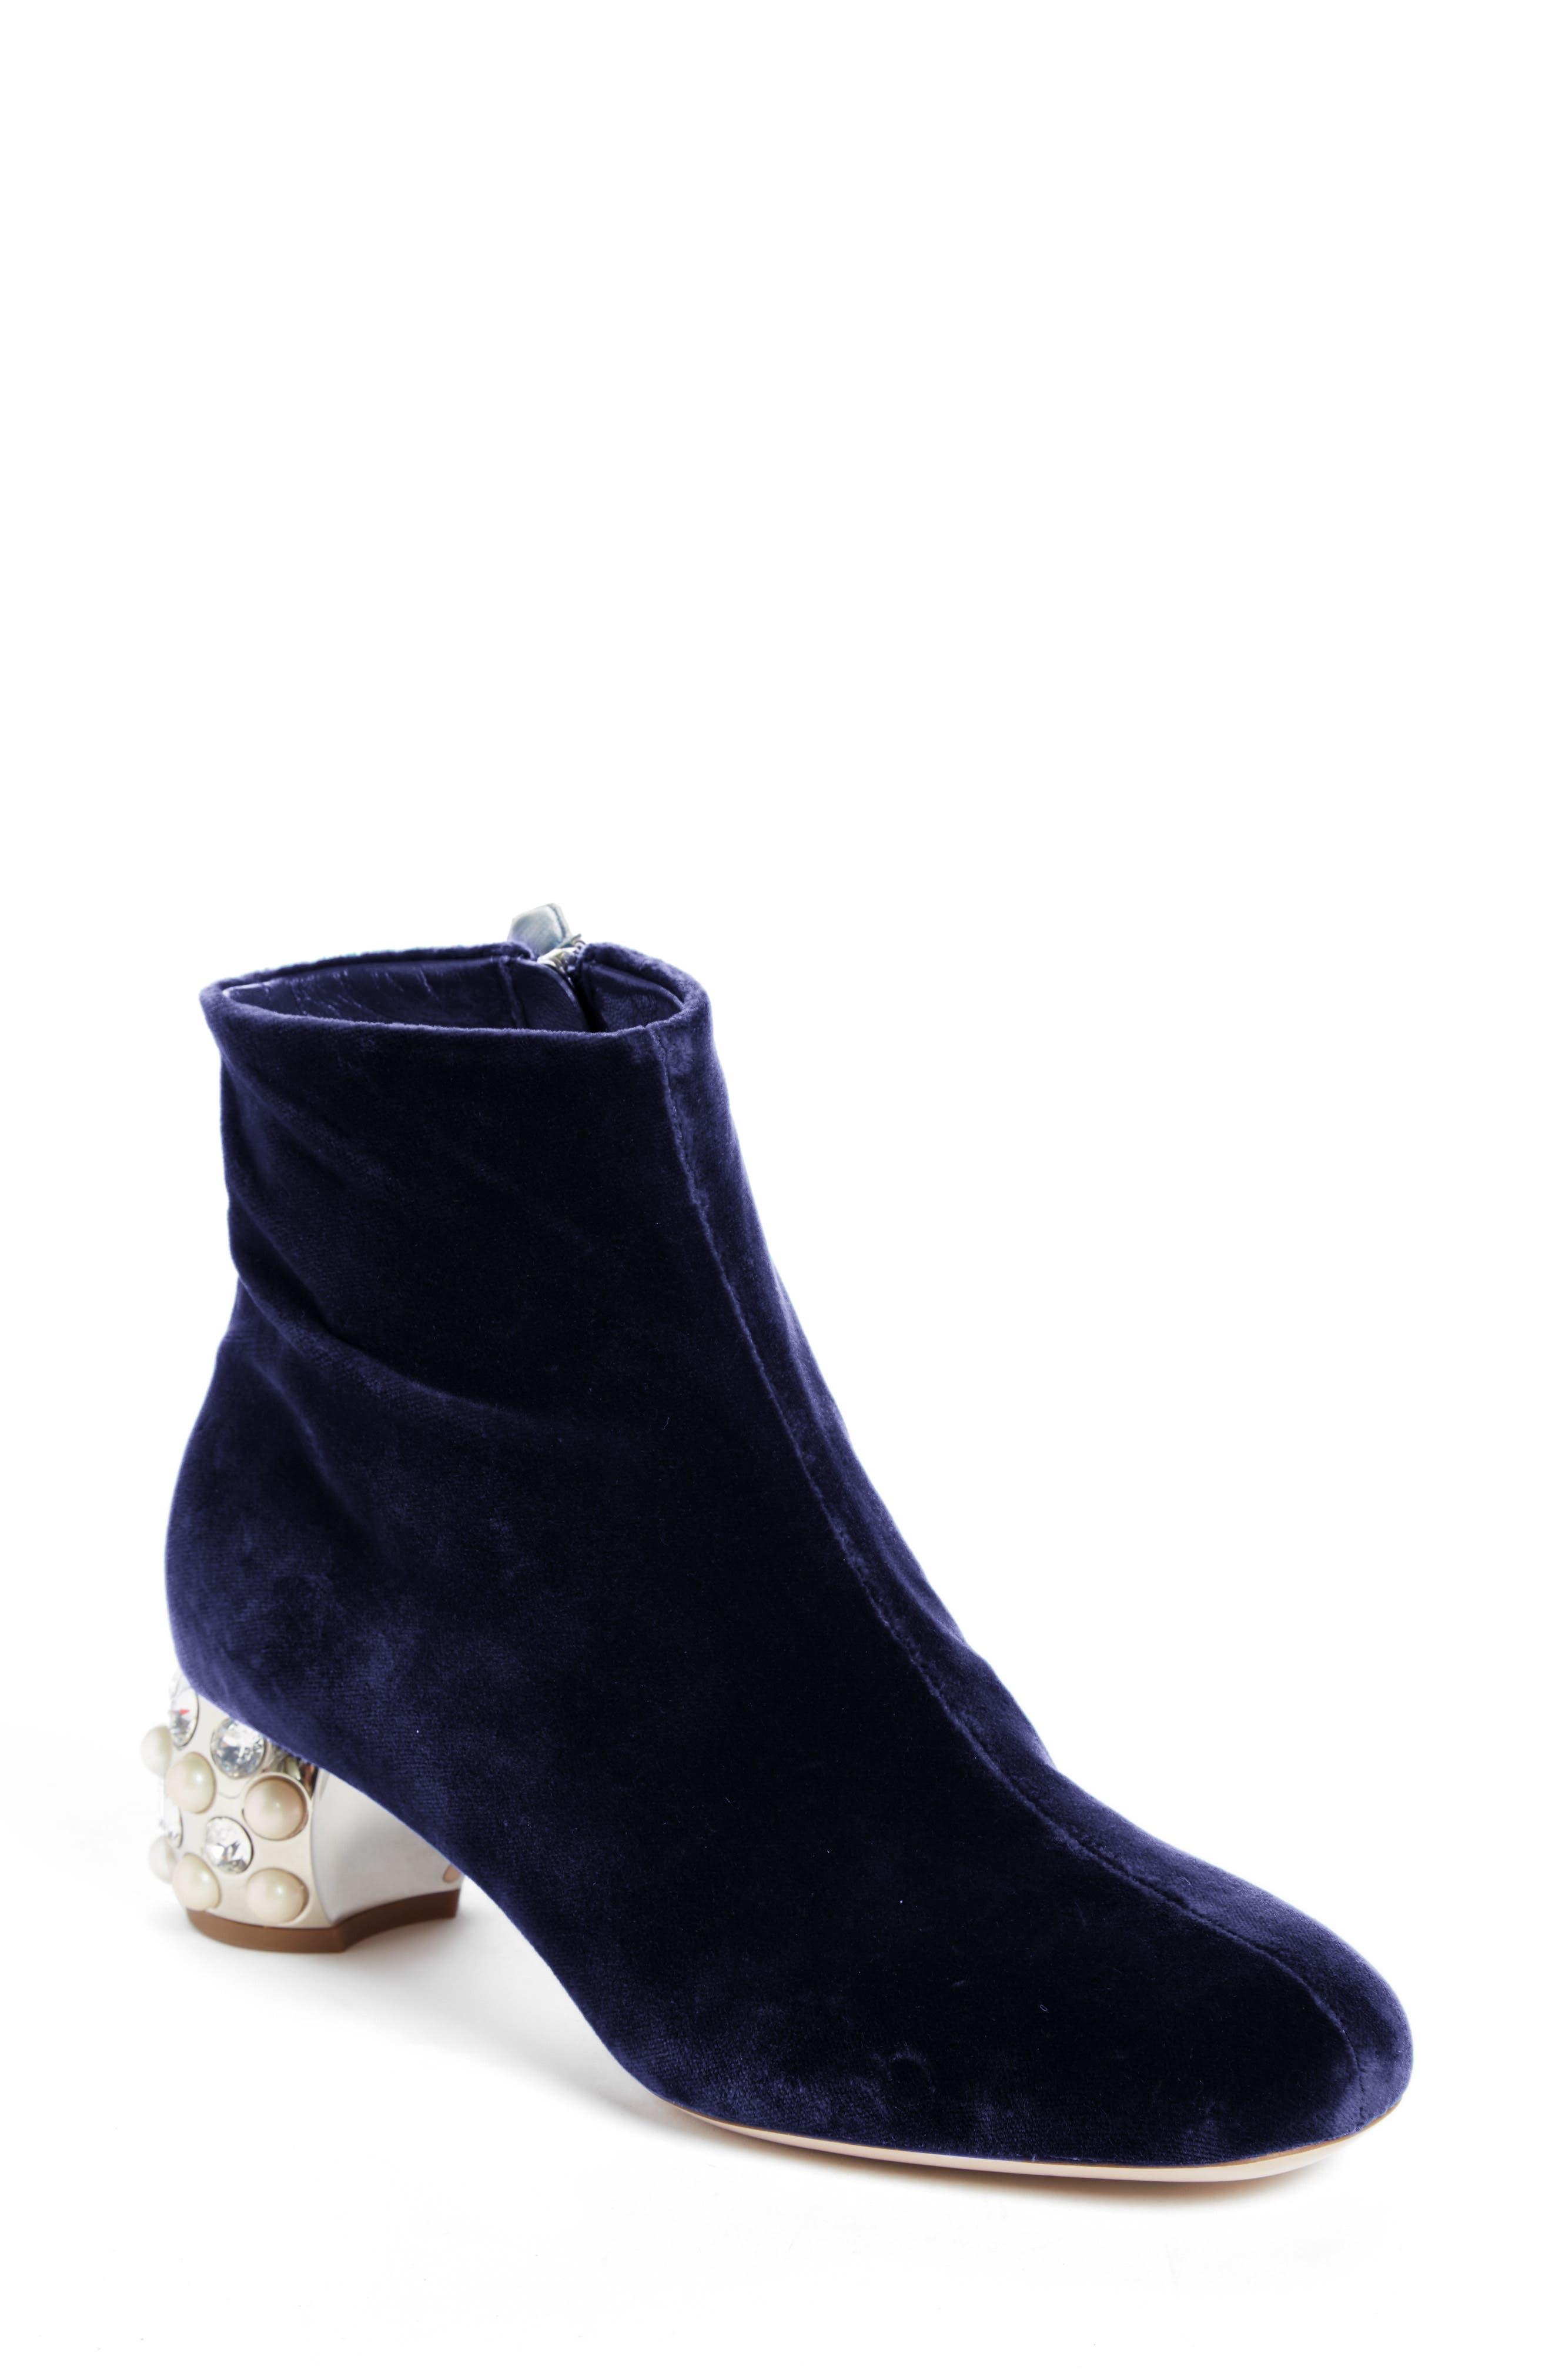 MIU MIU Embellished Block Heel Boot